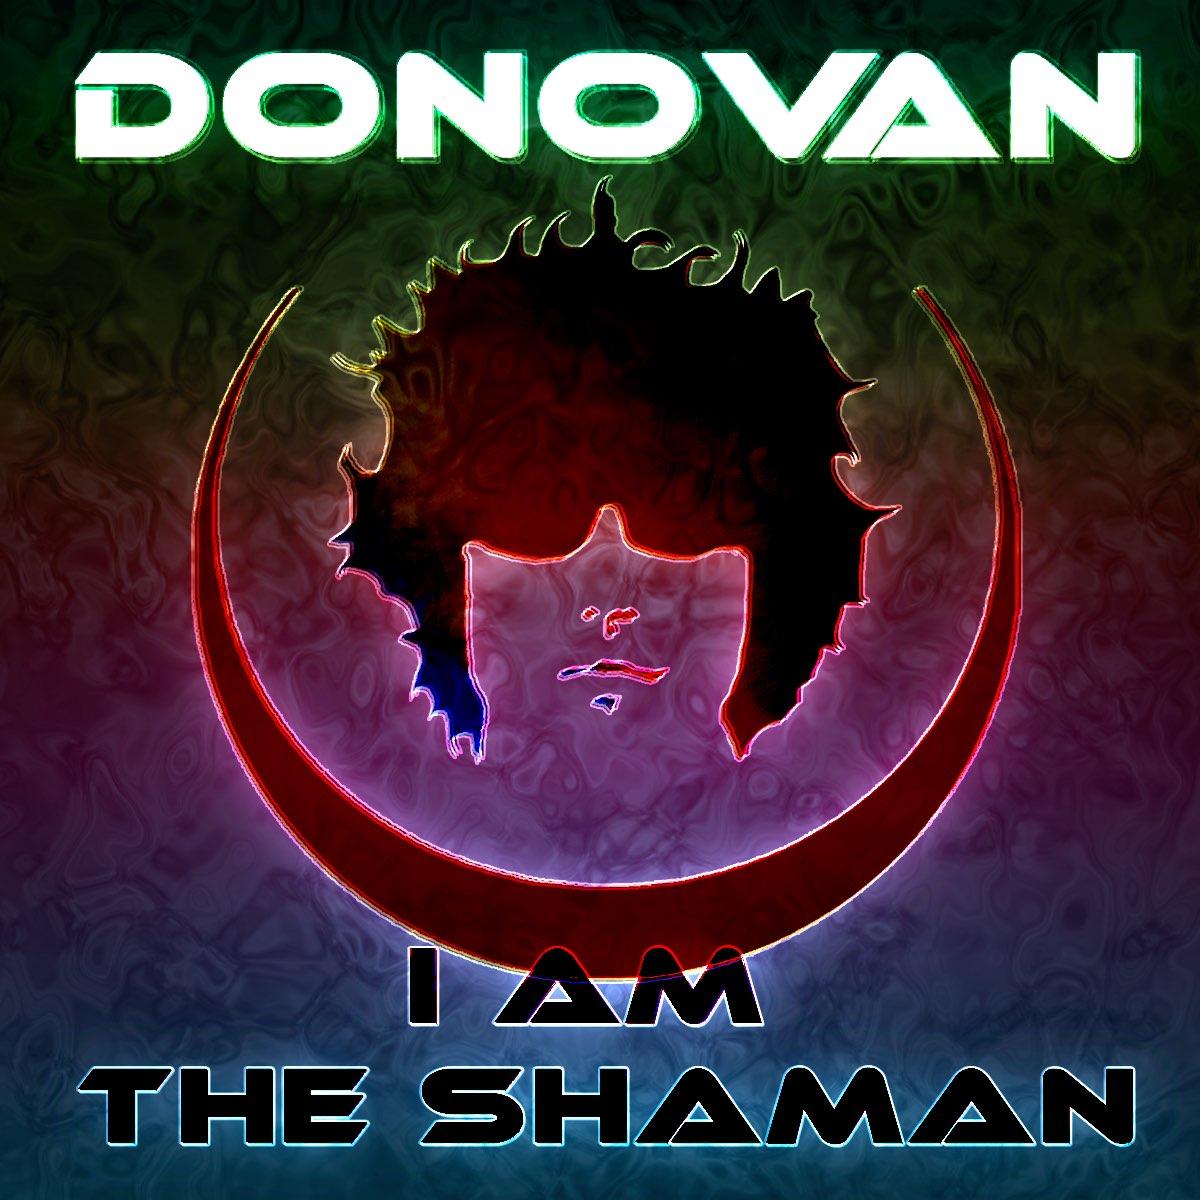 I Am the Shaman - Single de Donovan en Apple Music